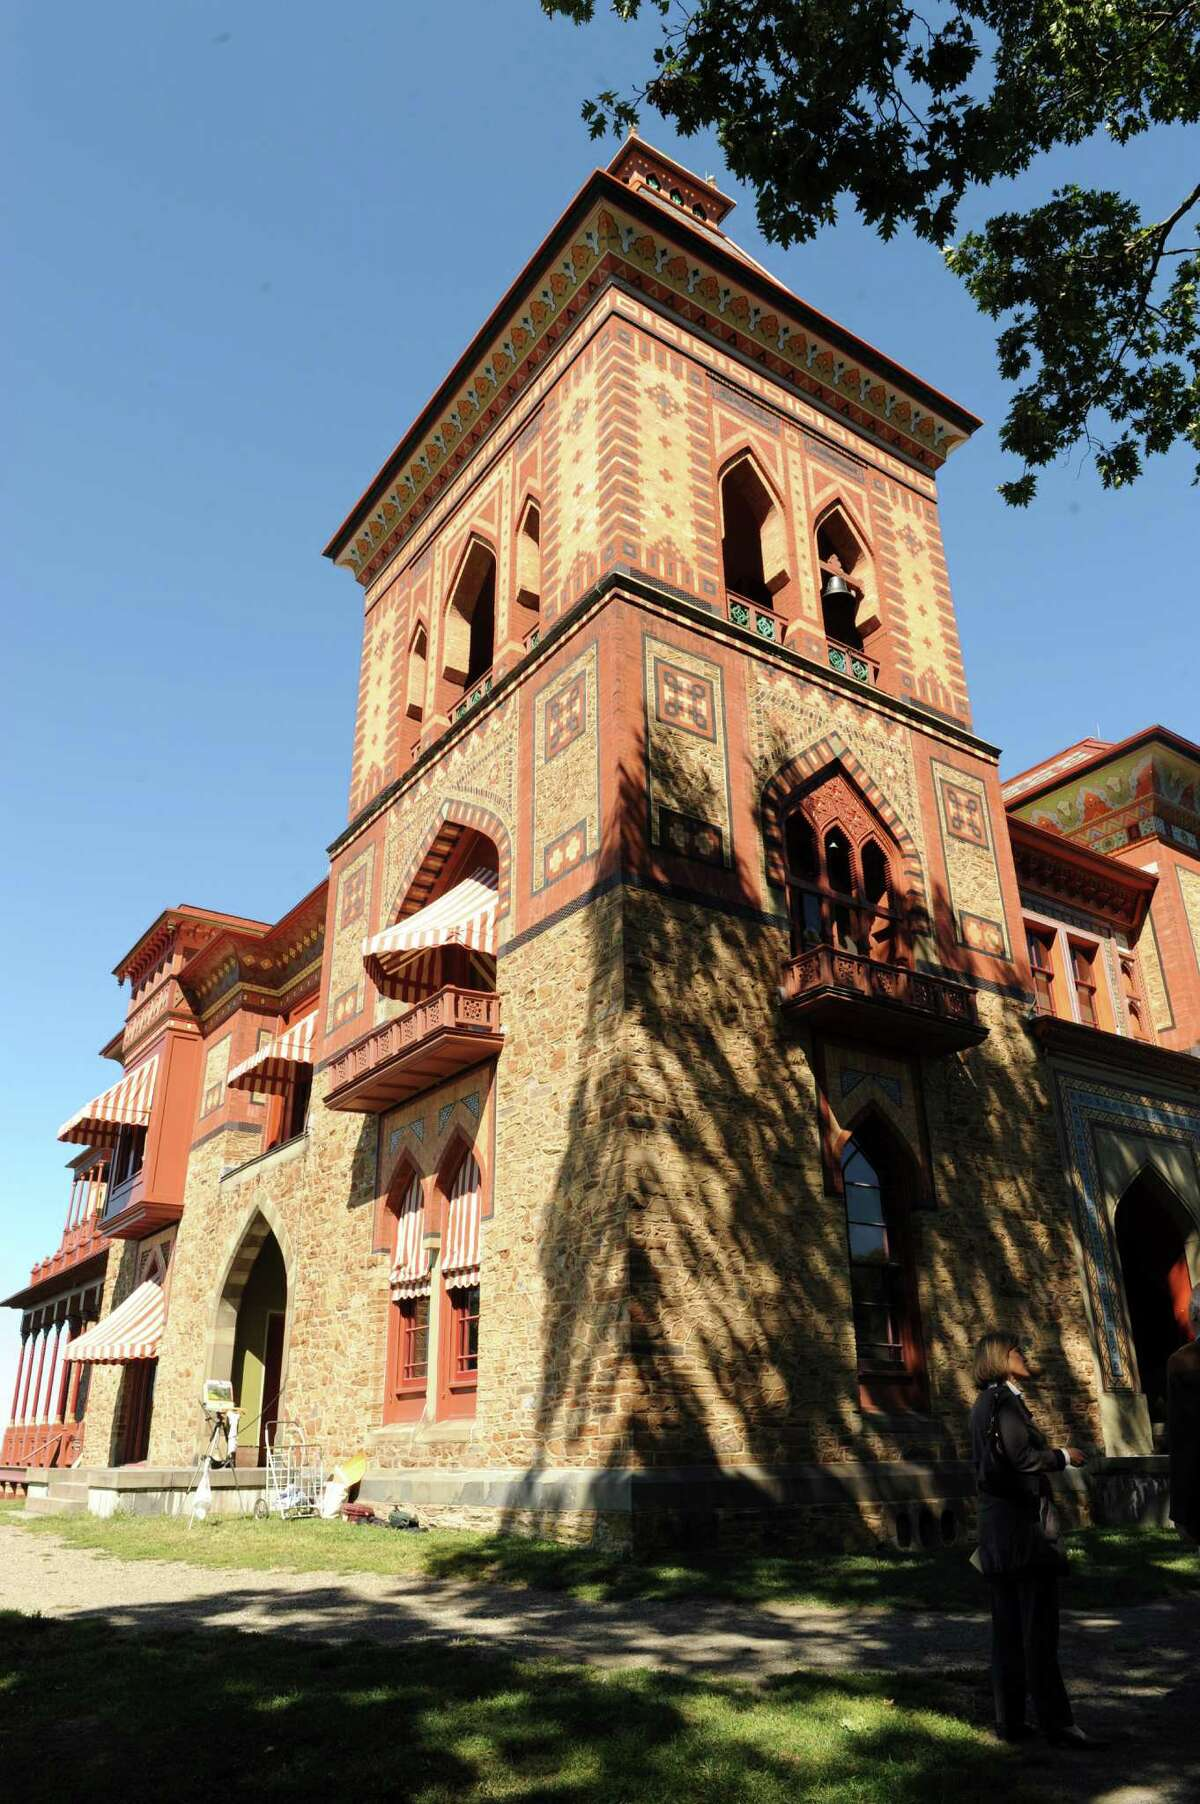 Olana the Hudson River School painter Fredrick Church's historic home on Thursday Sept. 19, 2013 in Hudson, N.Y. (Michael P. Farrell/Times Union)